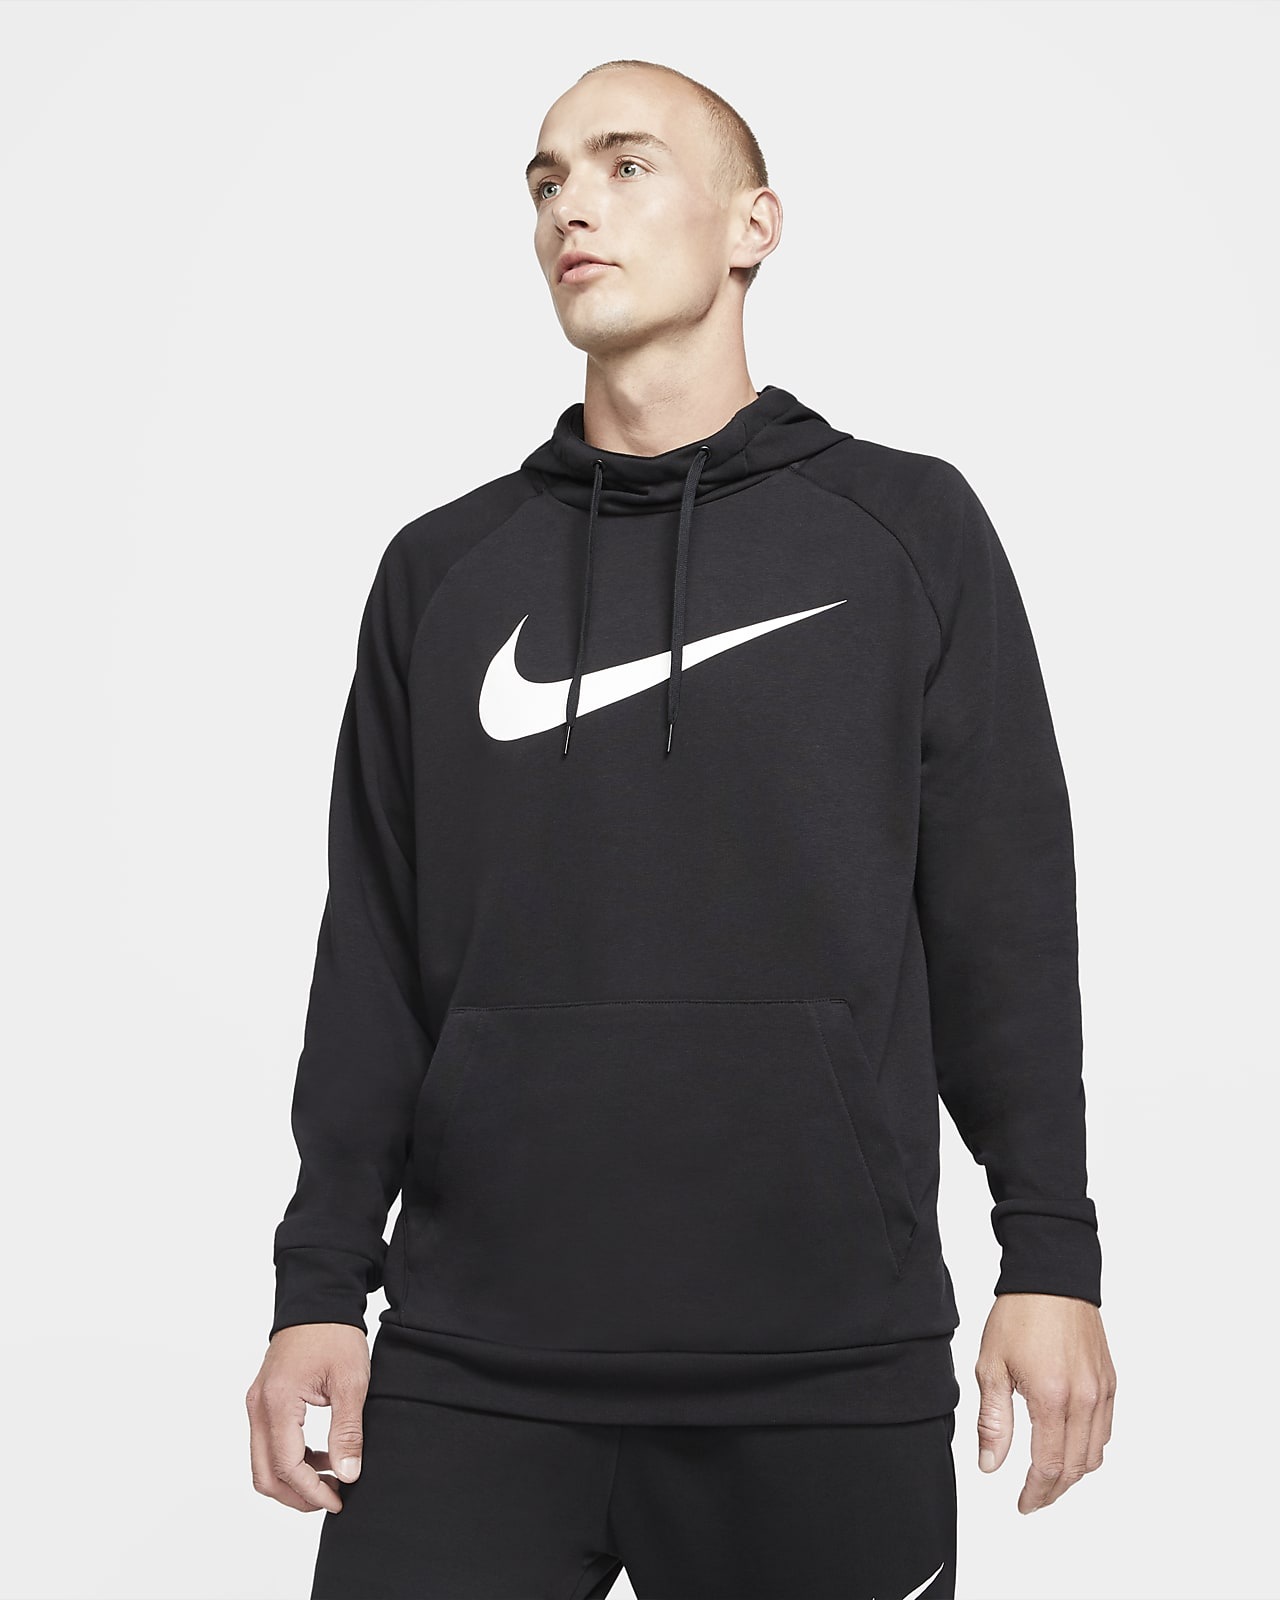 Nike Dri-FIT belebújós, kapucnis férfi edzőpulóver